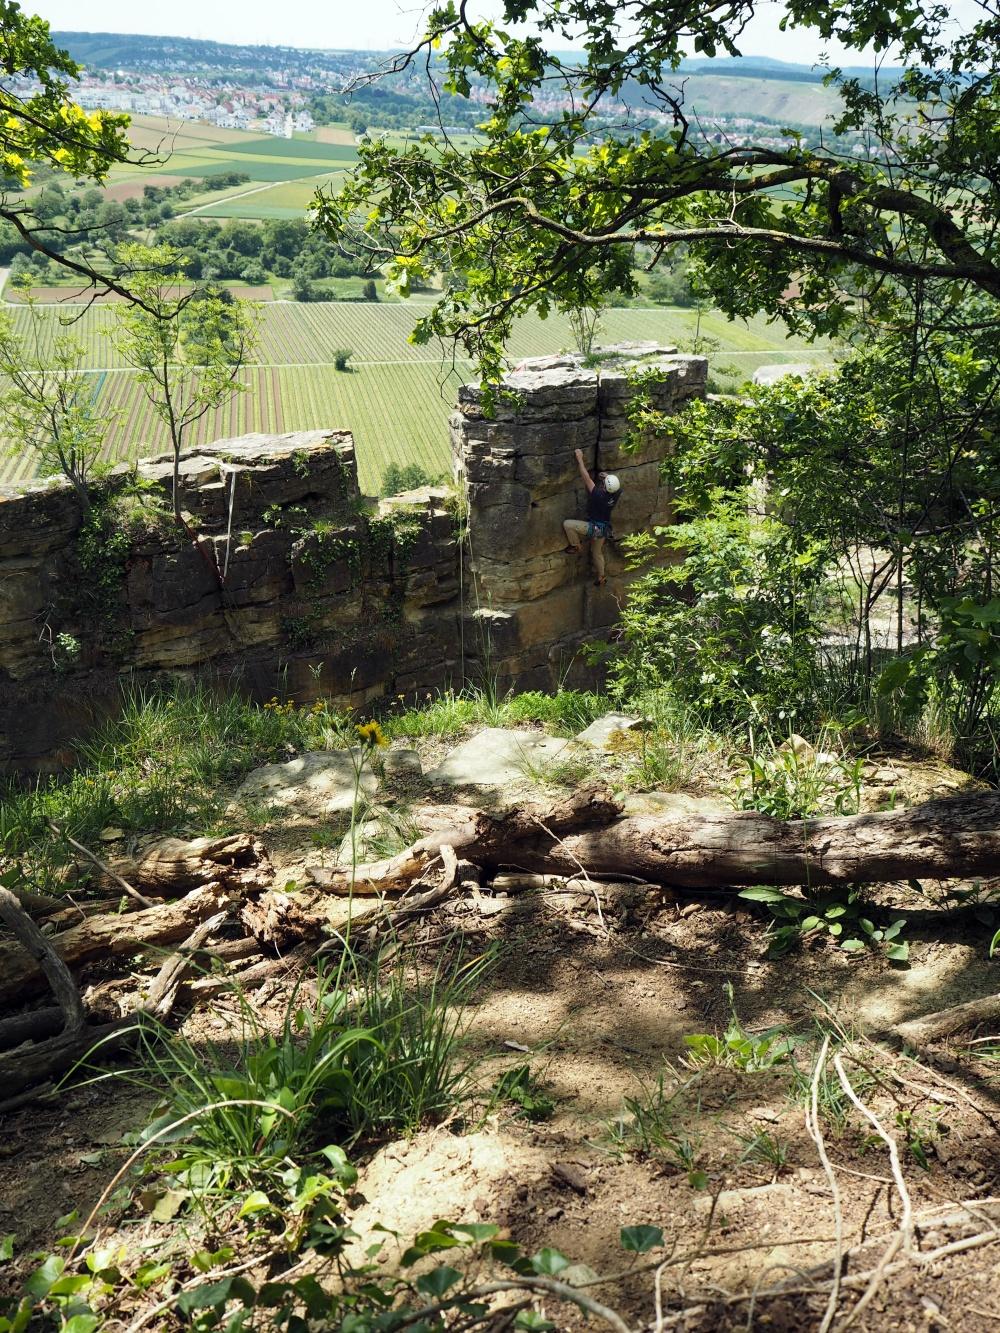 Felsengärten Hessigheim